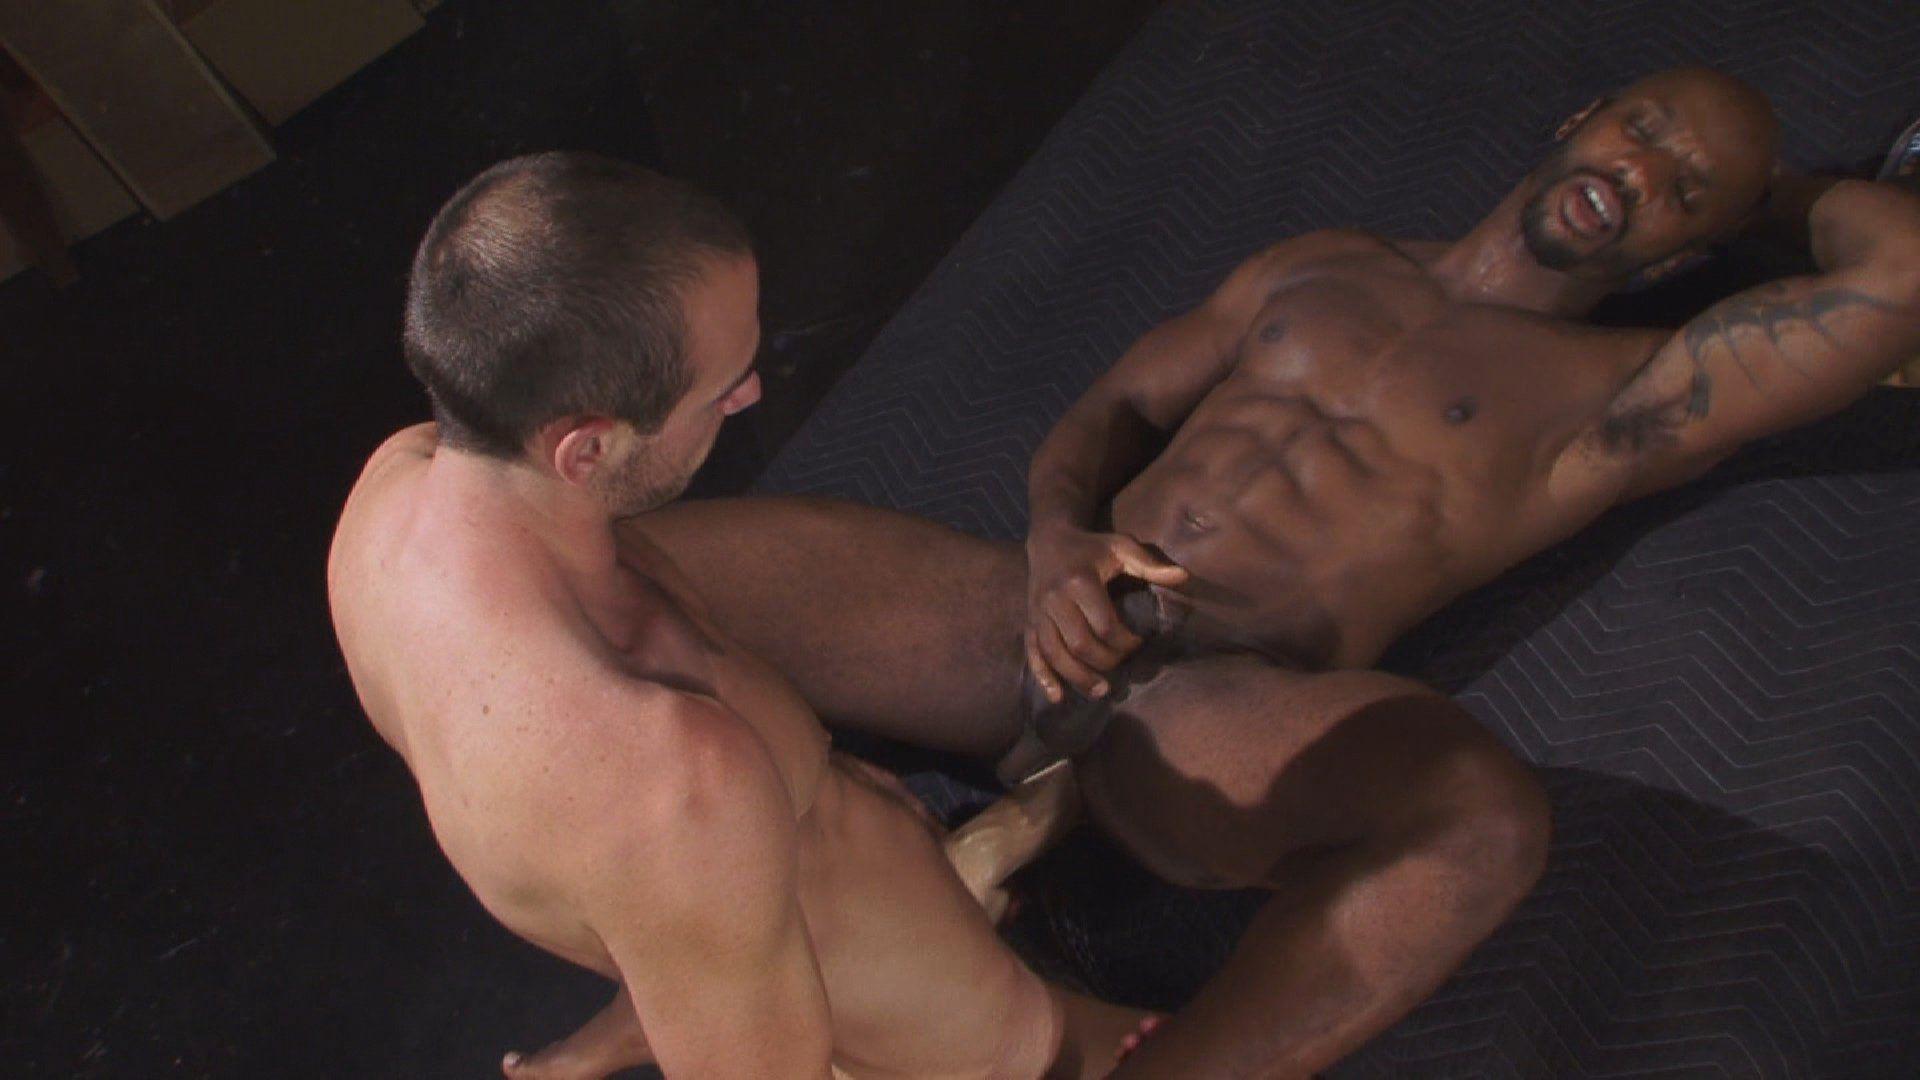 interracial sex Extreme gay